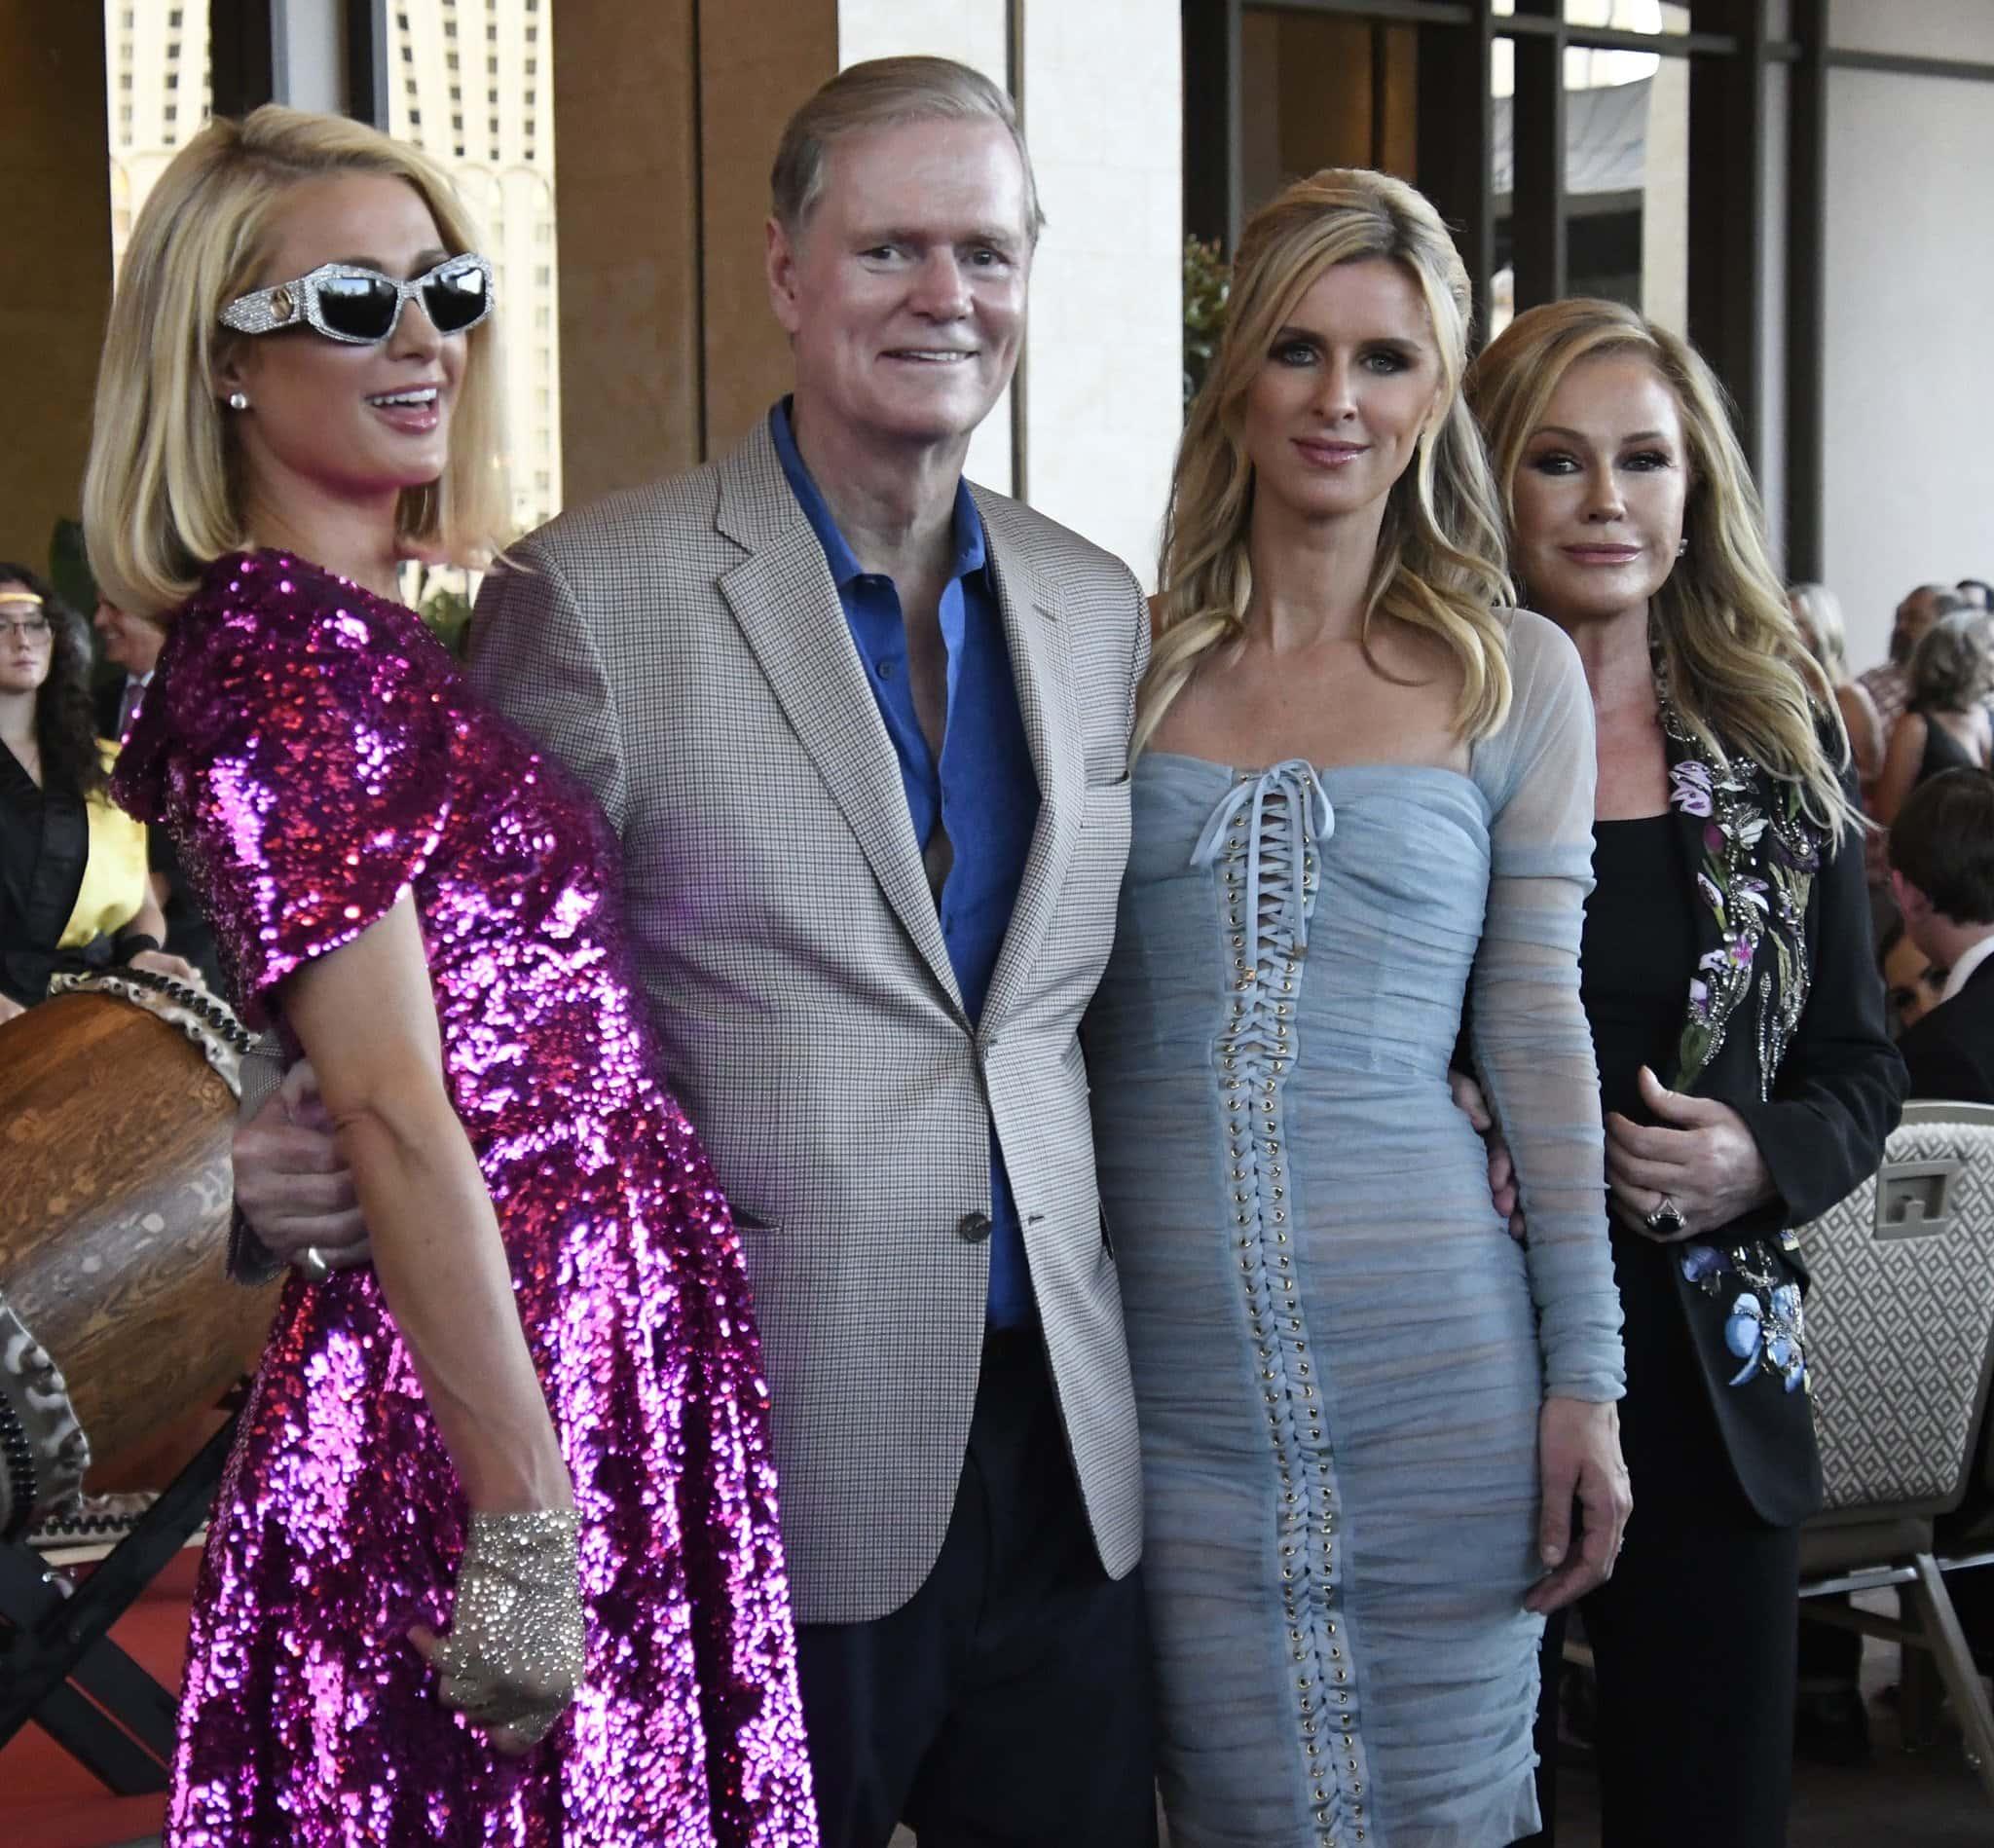 The Hilton family: Paris Hilton, Richard Hilton, Nicky Hilton, and Kathy Hilton pose together at the grand opening of Resorts World Las Vegas